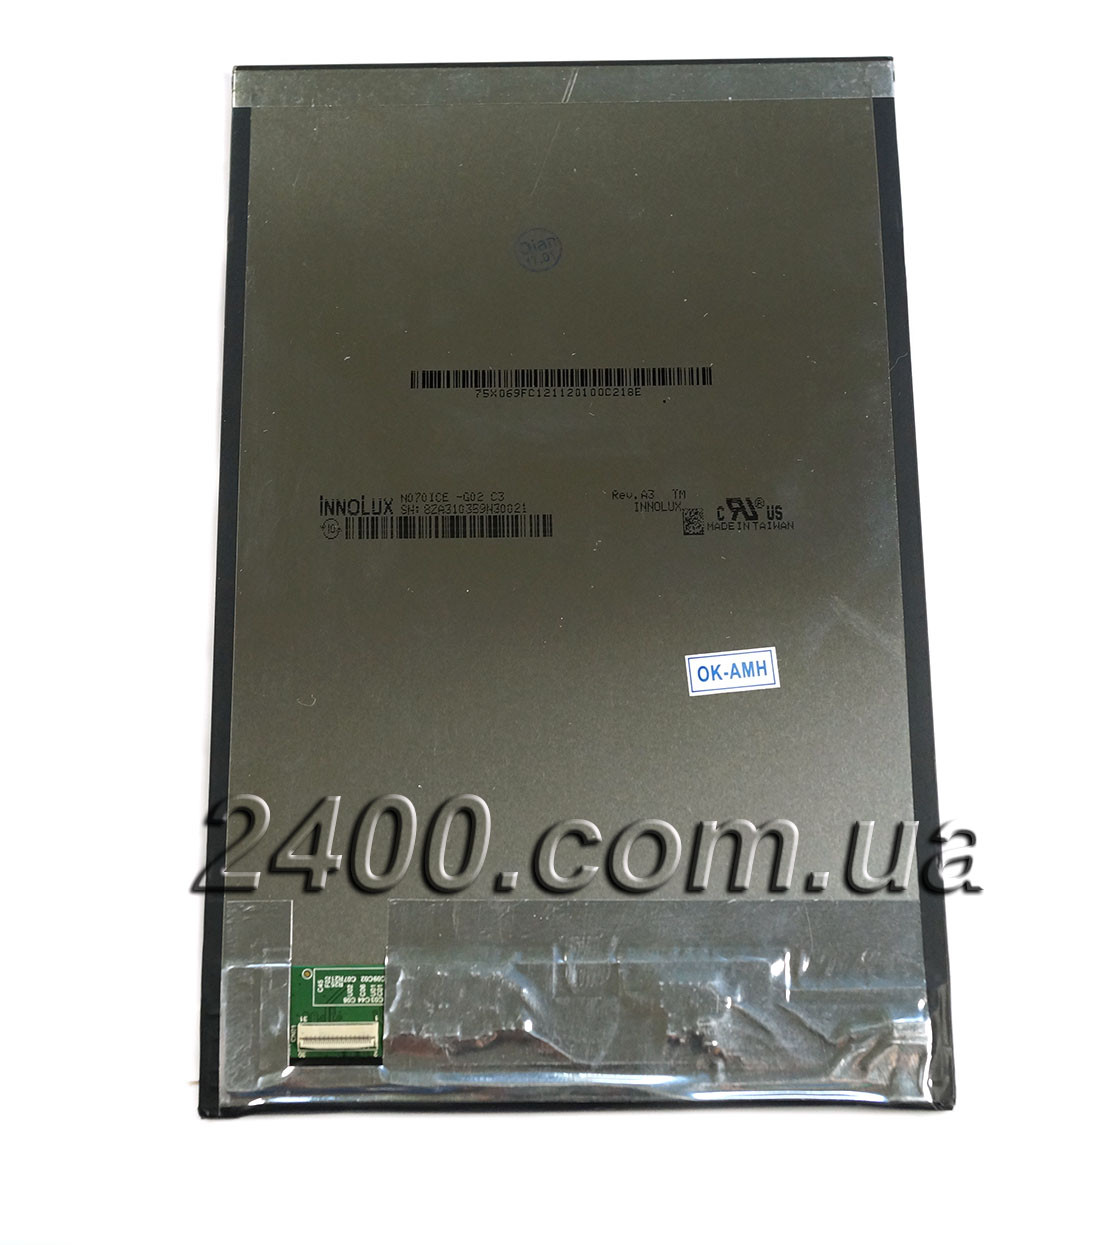 Дисплей - матрица для планшета Nomi C070010 Corsa, C070020 Corsa Pro 3G 31 pin тип 1 (экран) N070ICE-G02